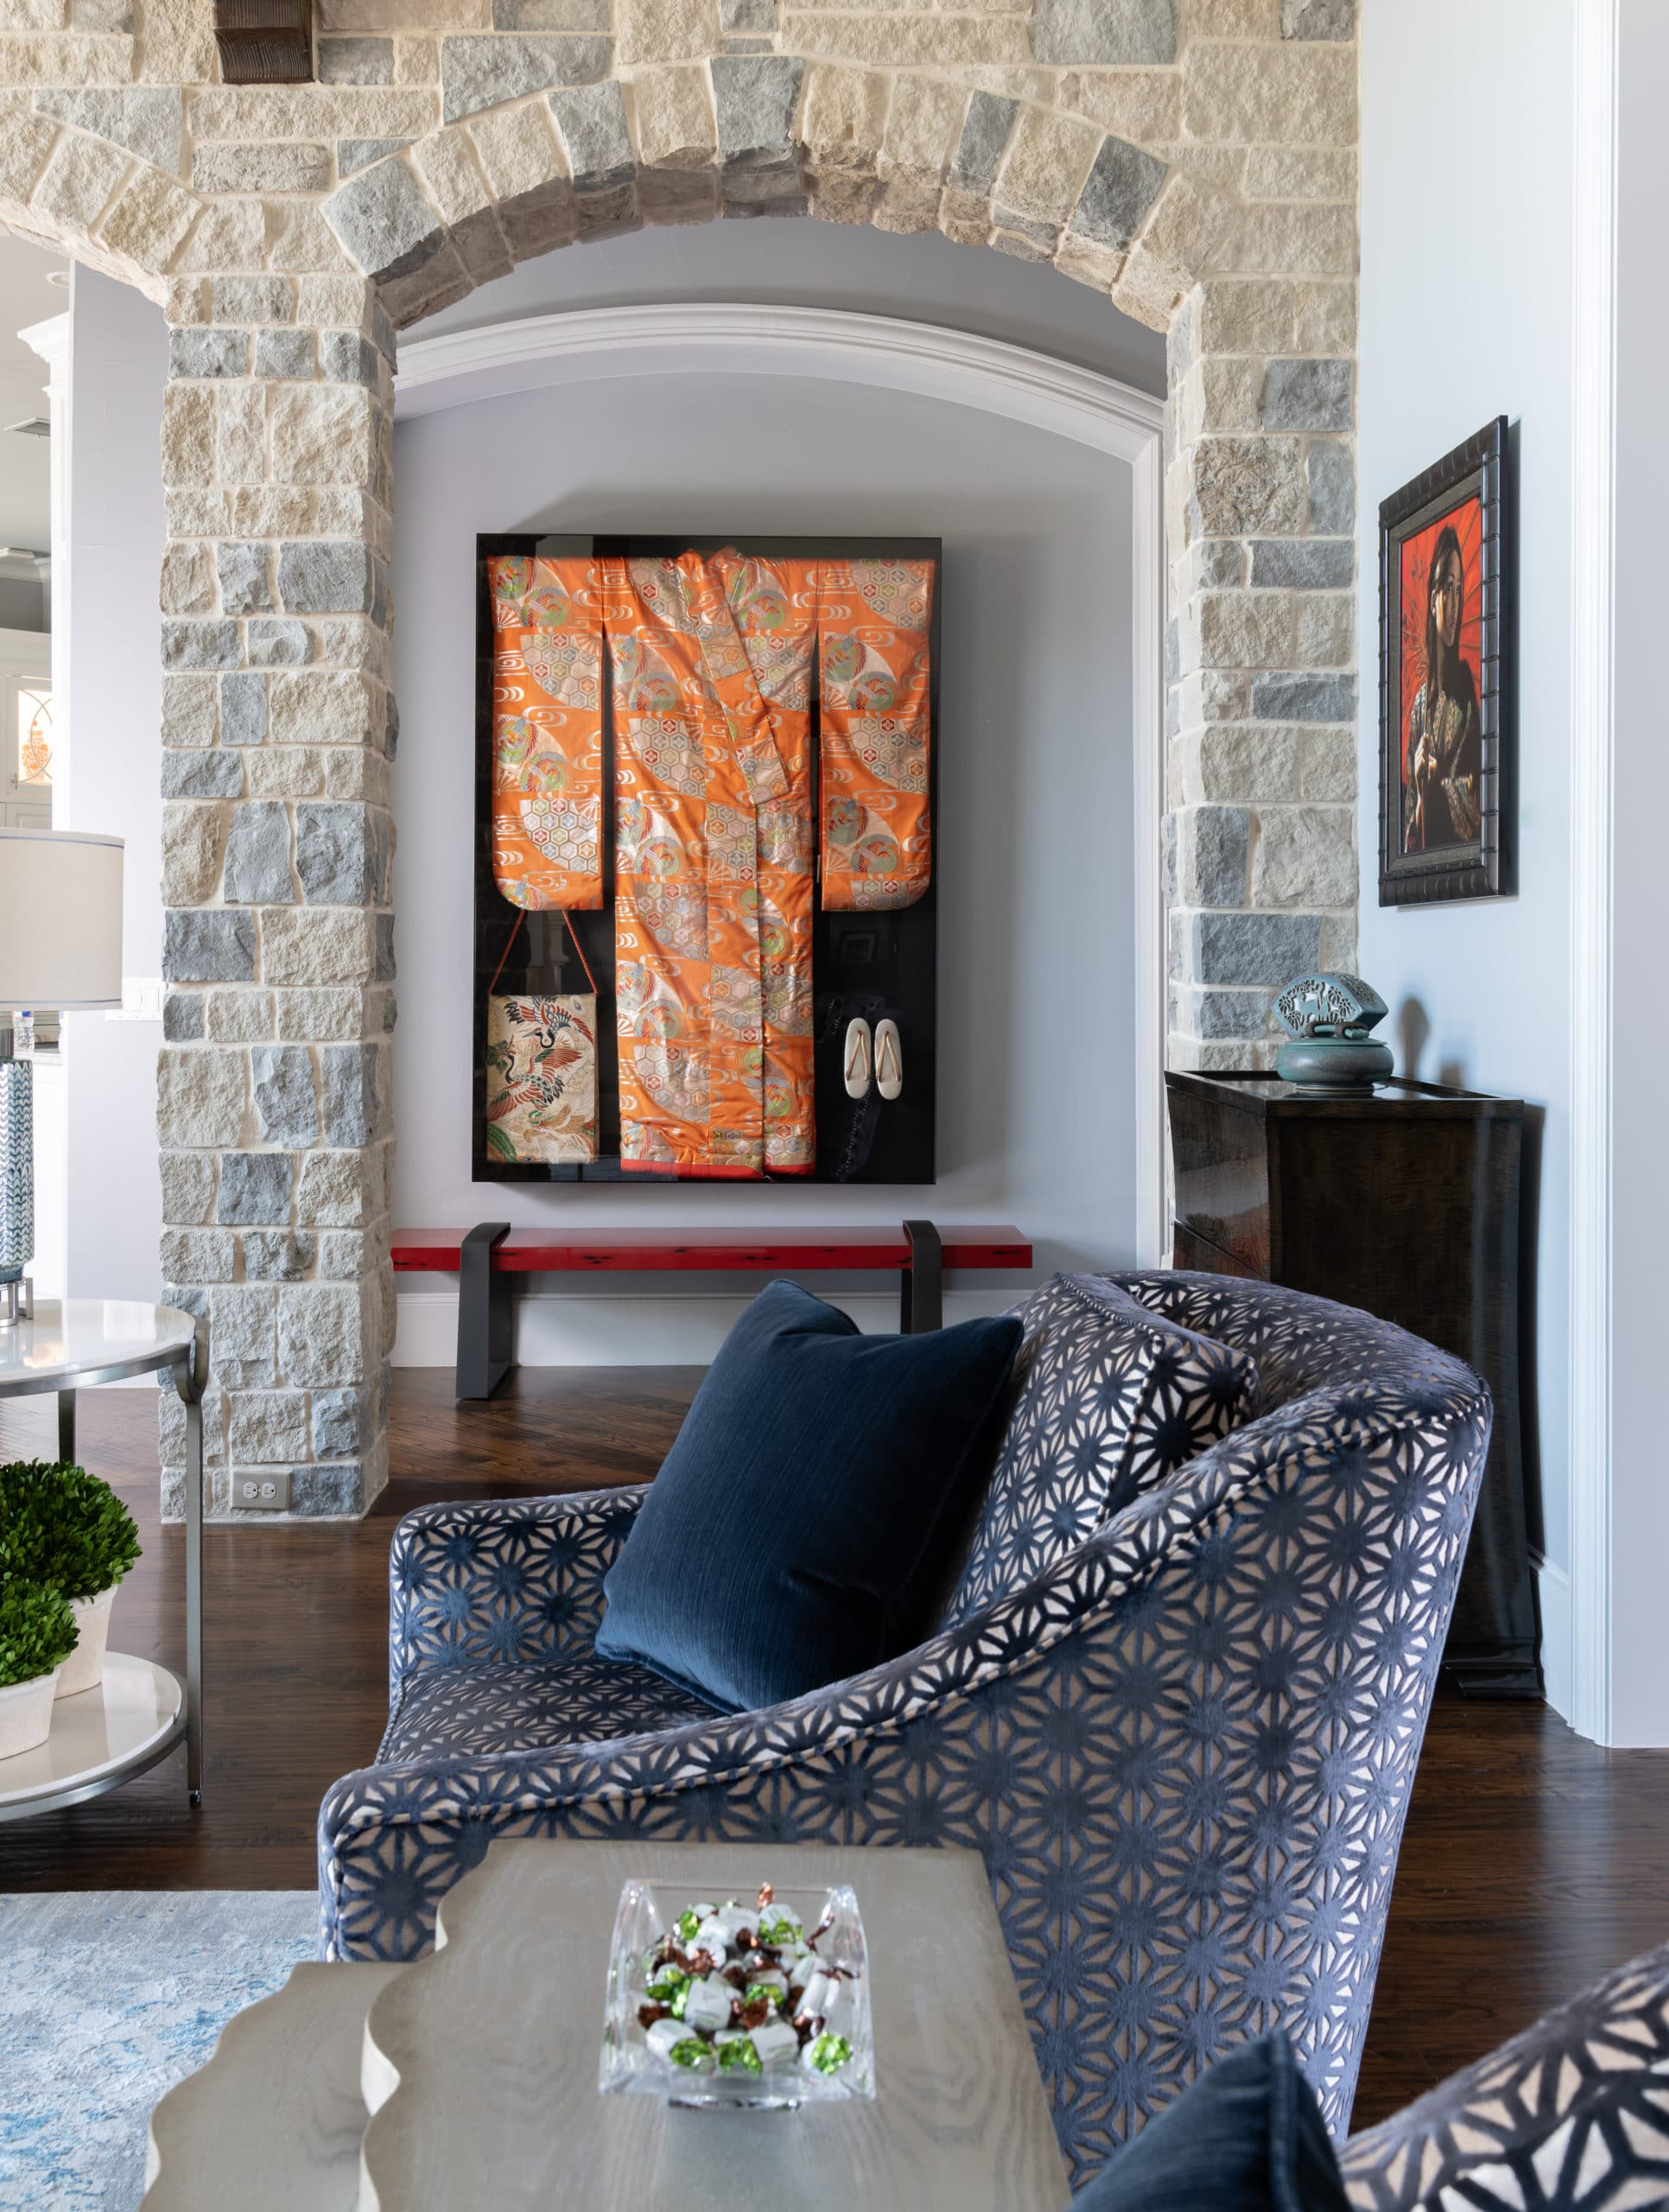 Home Tours 3 | Award-Winning Interior Designers, Interior Decorators, Kitchen Designers, Bath Designers, Home Renovations, Window Treatments, & Custom Furniture D'KOR HOME by Dee Frazier Interiors | Interior Designer Dallas TX